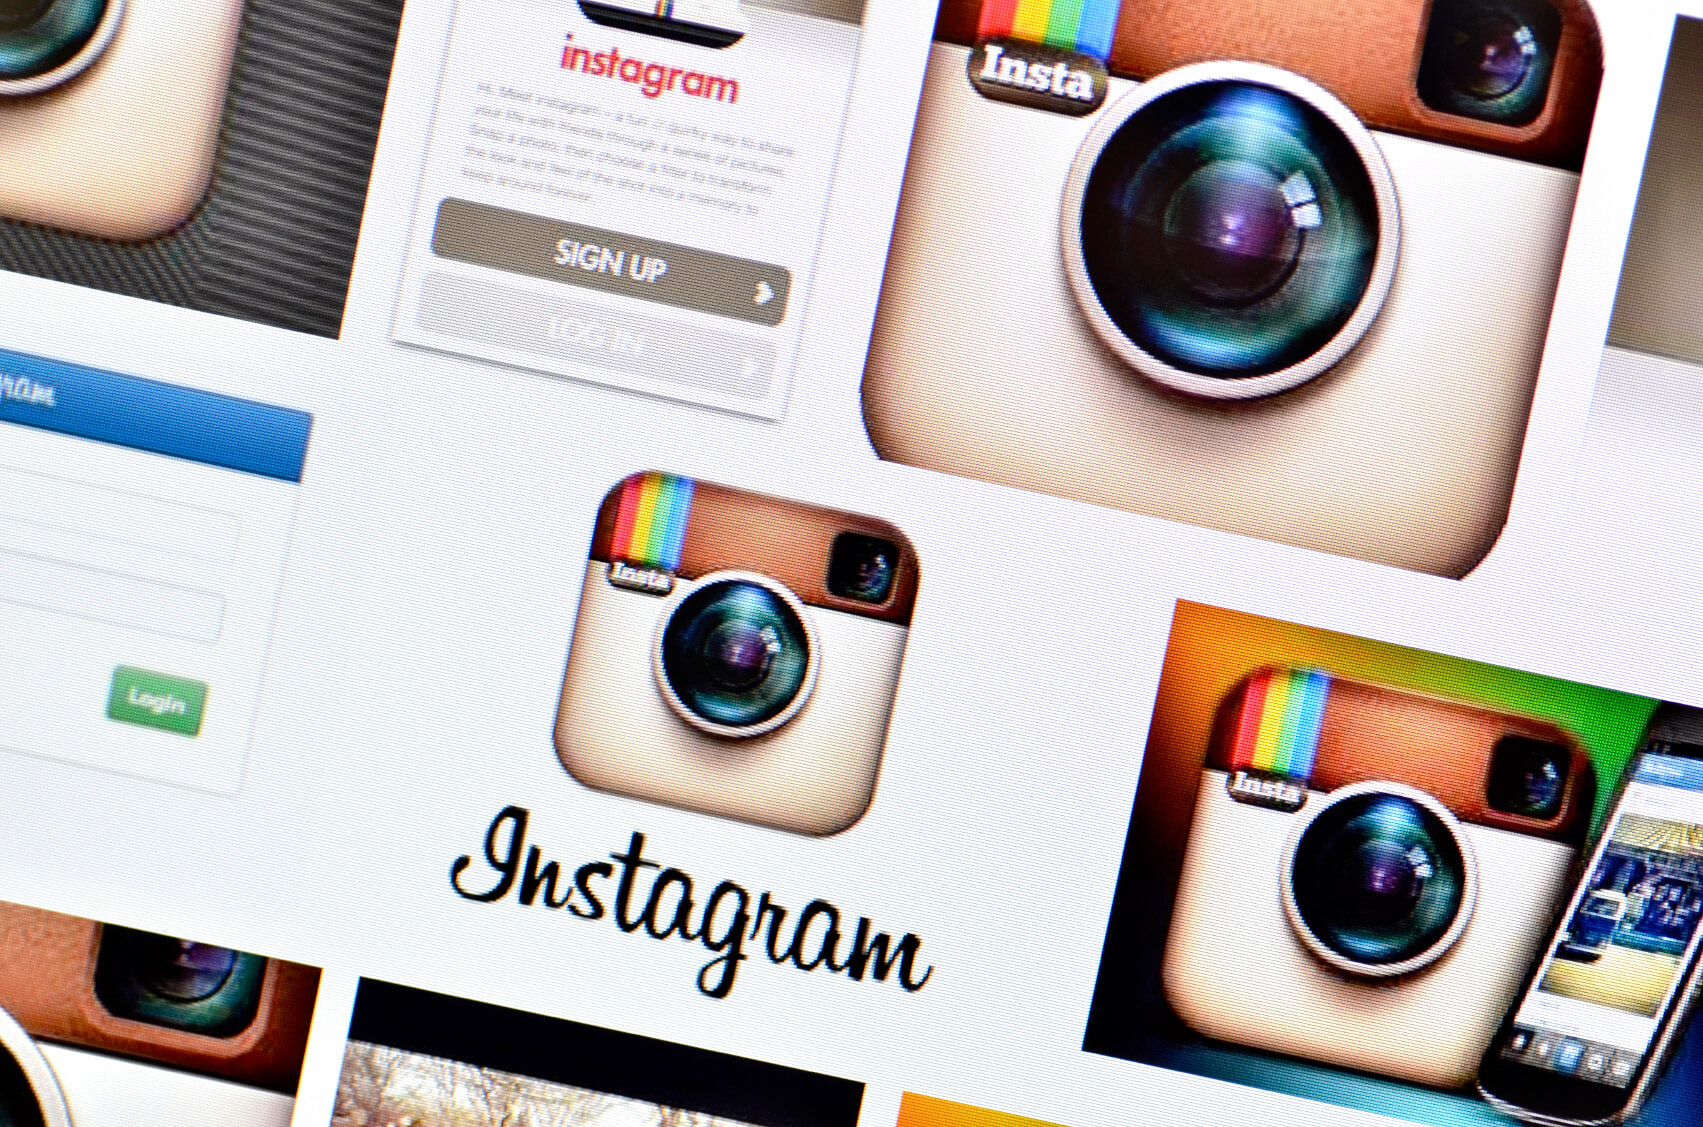 iStock_Instagram_Photo_Final.jpg